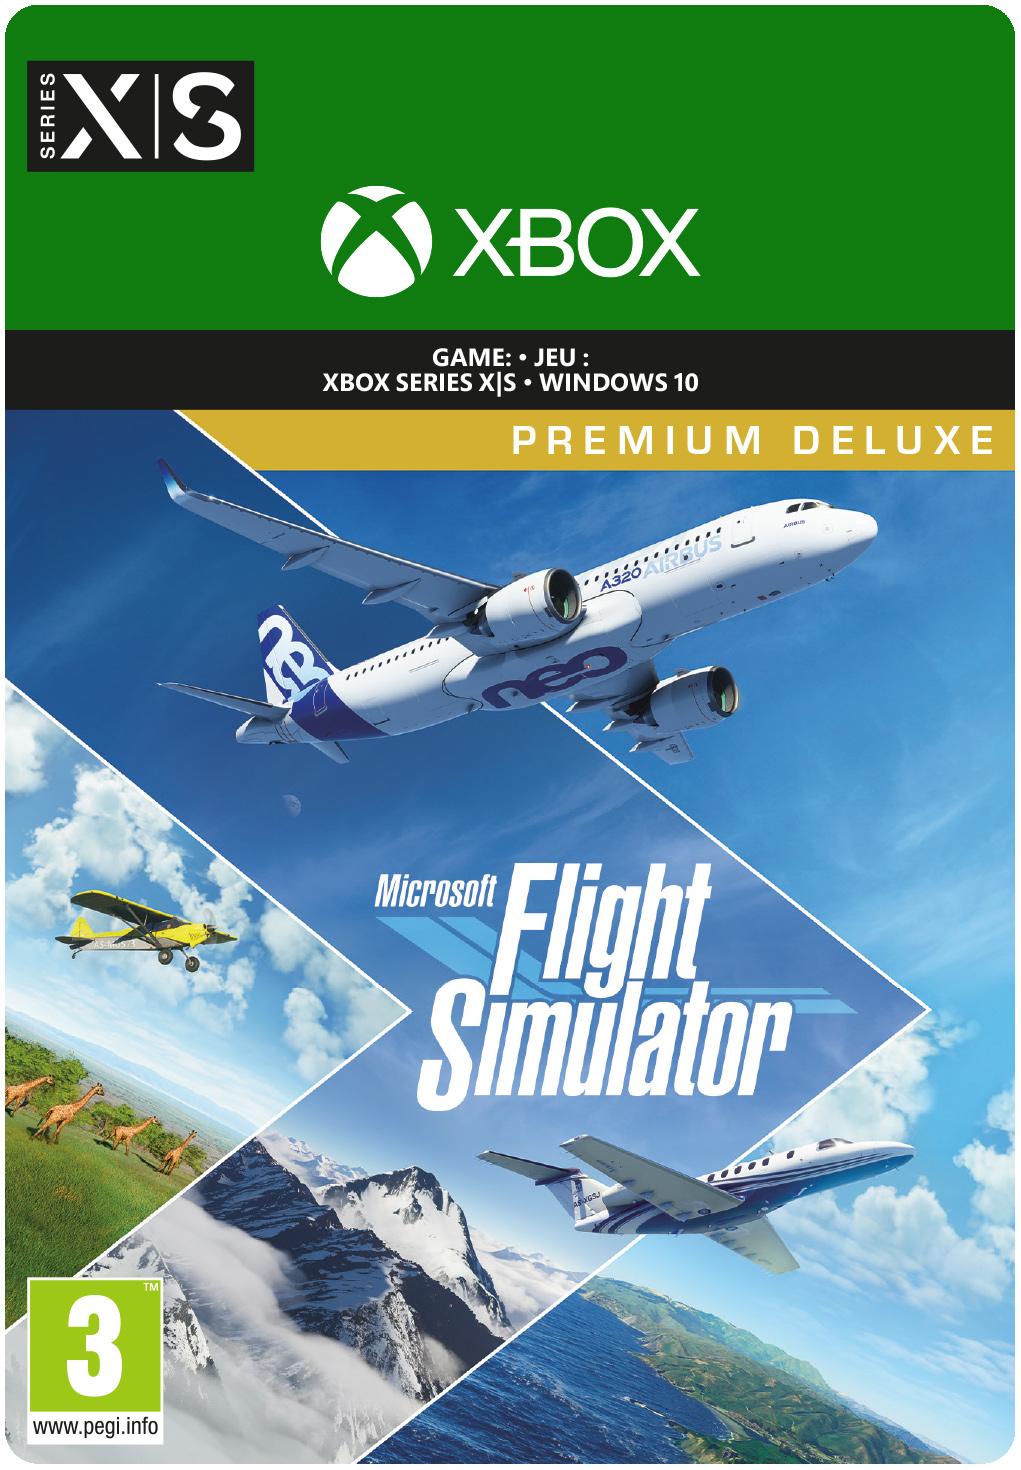 Microsoft Flight Simulator: Premium Deluxe Edition - Xbox Series X/S / PC (Digitale Game)